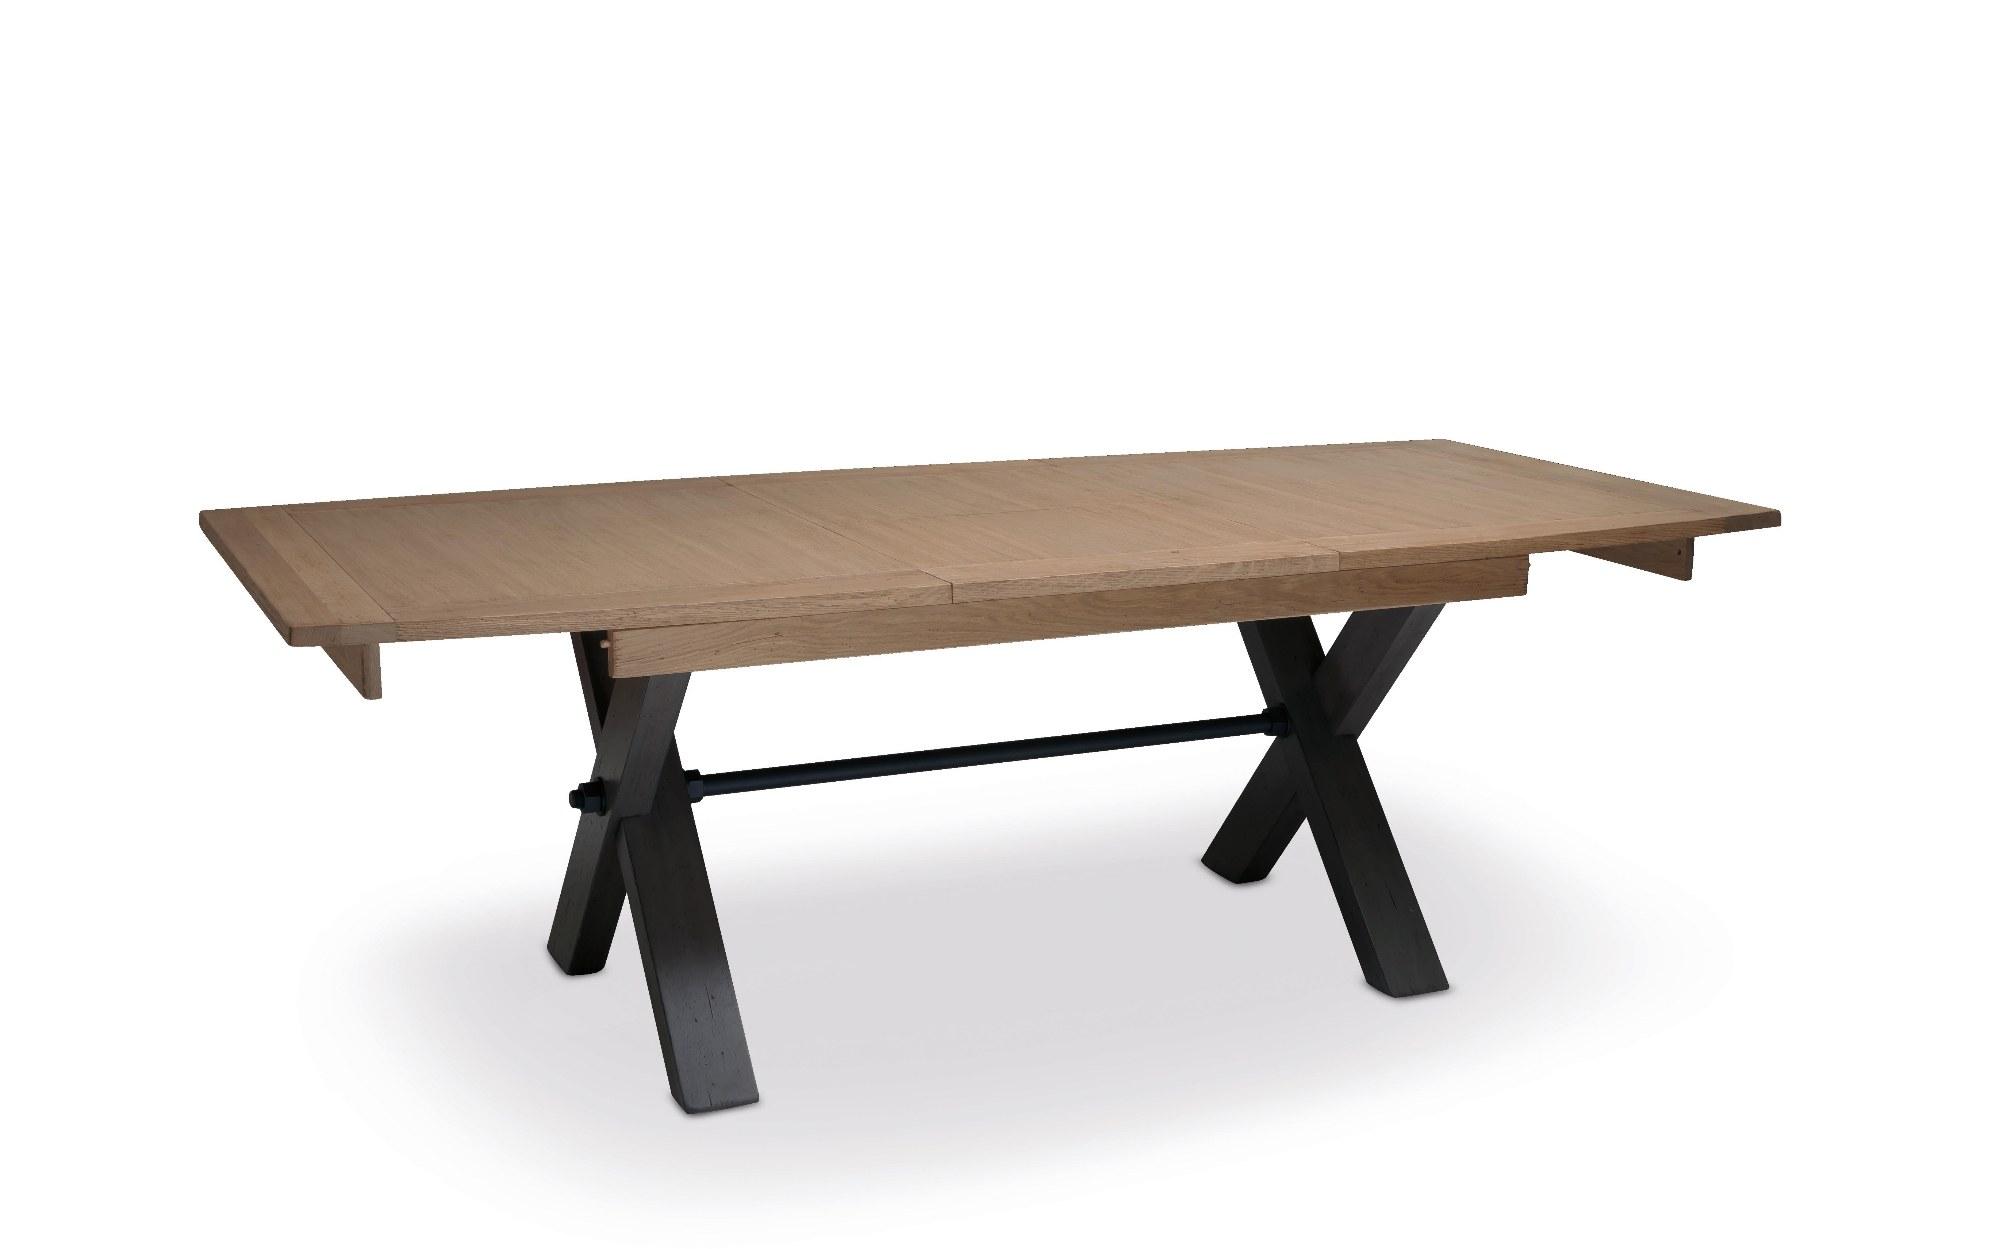 MAGELLAN TABLE PIED X PLATEAU BOIS ALLONGE